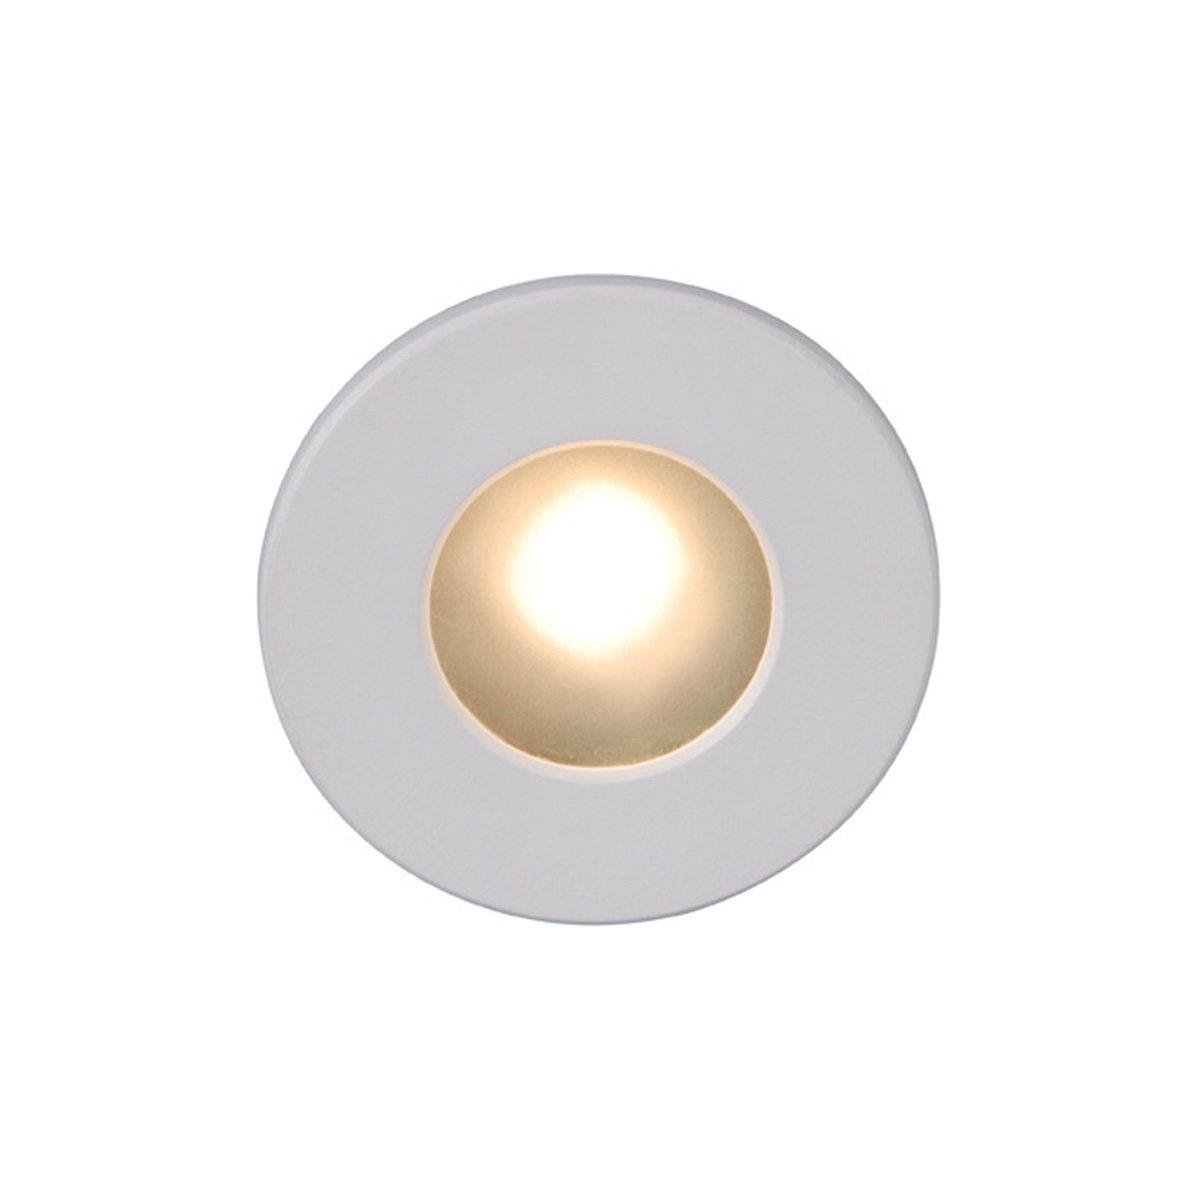 WAC Lighting WL-LED310-C-WT LED Step Light Circular Face by WAC Lighting